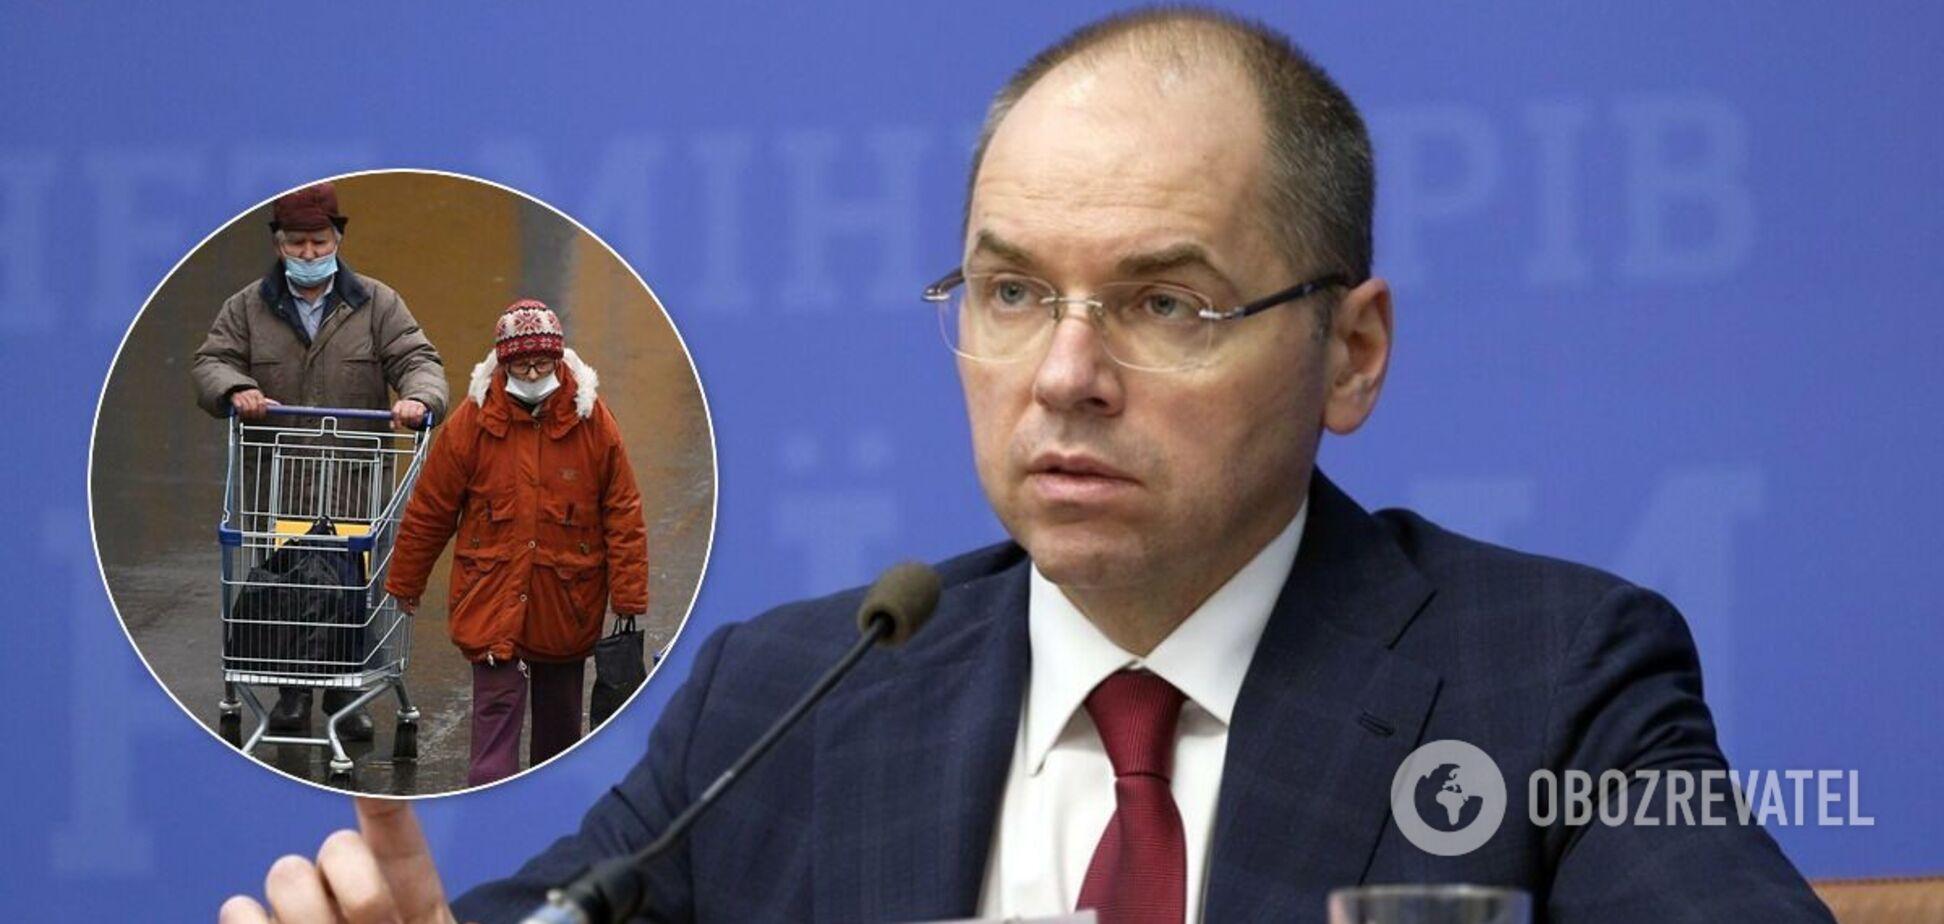 Степанов заявил о необходимости карантина